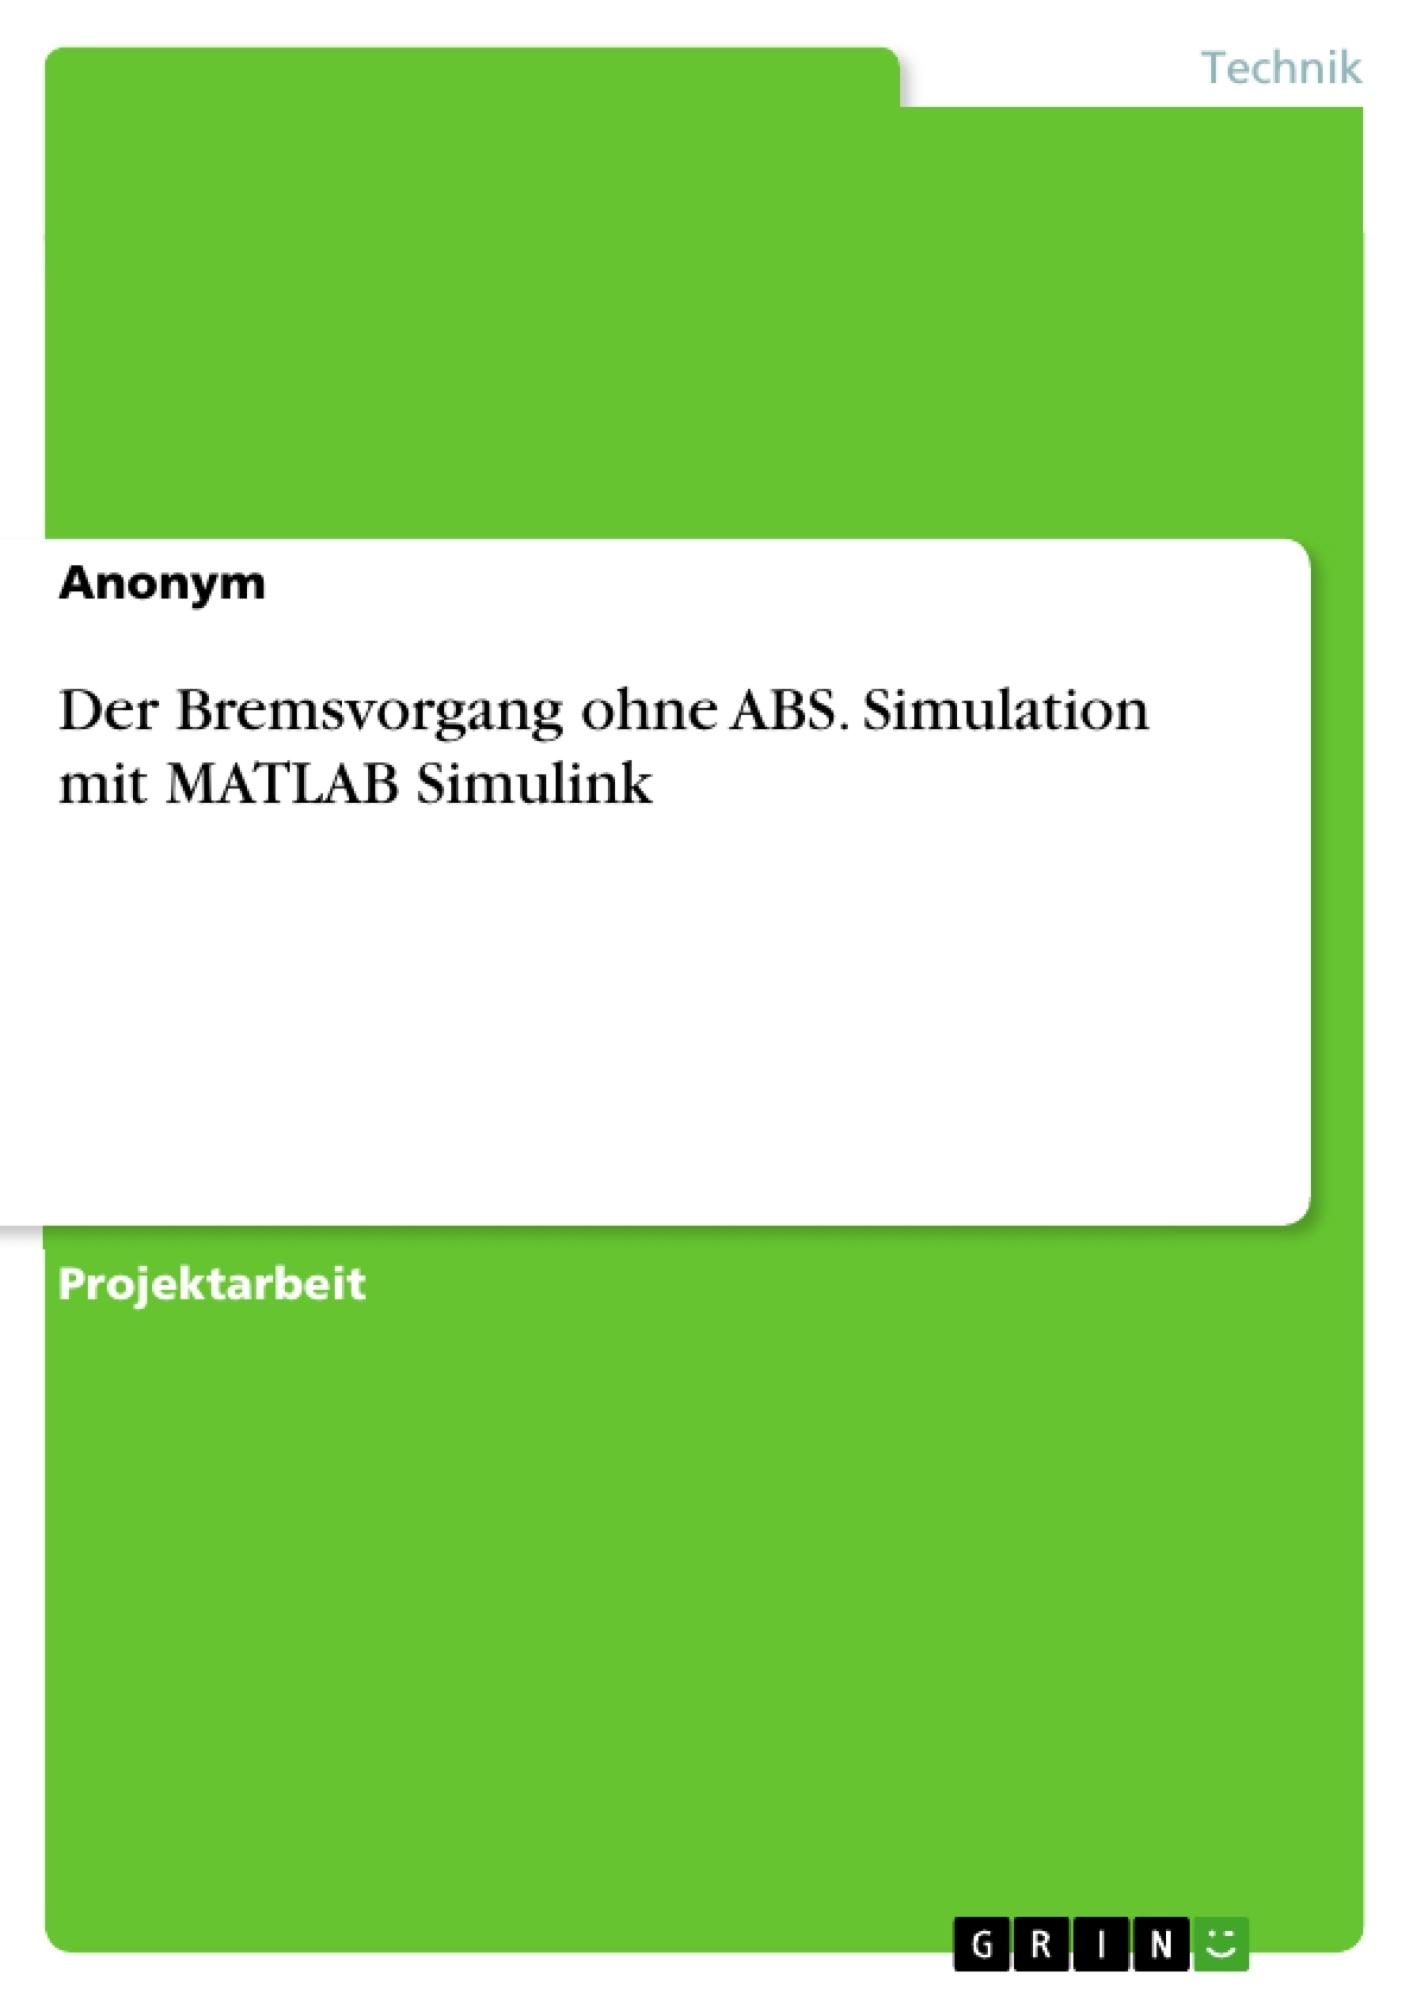 Titel: Der Bremsvorgang ohne ABS. Simulation mit MATLAB Simulink